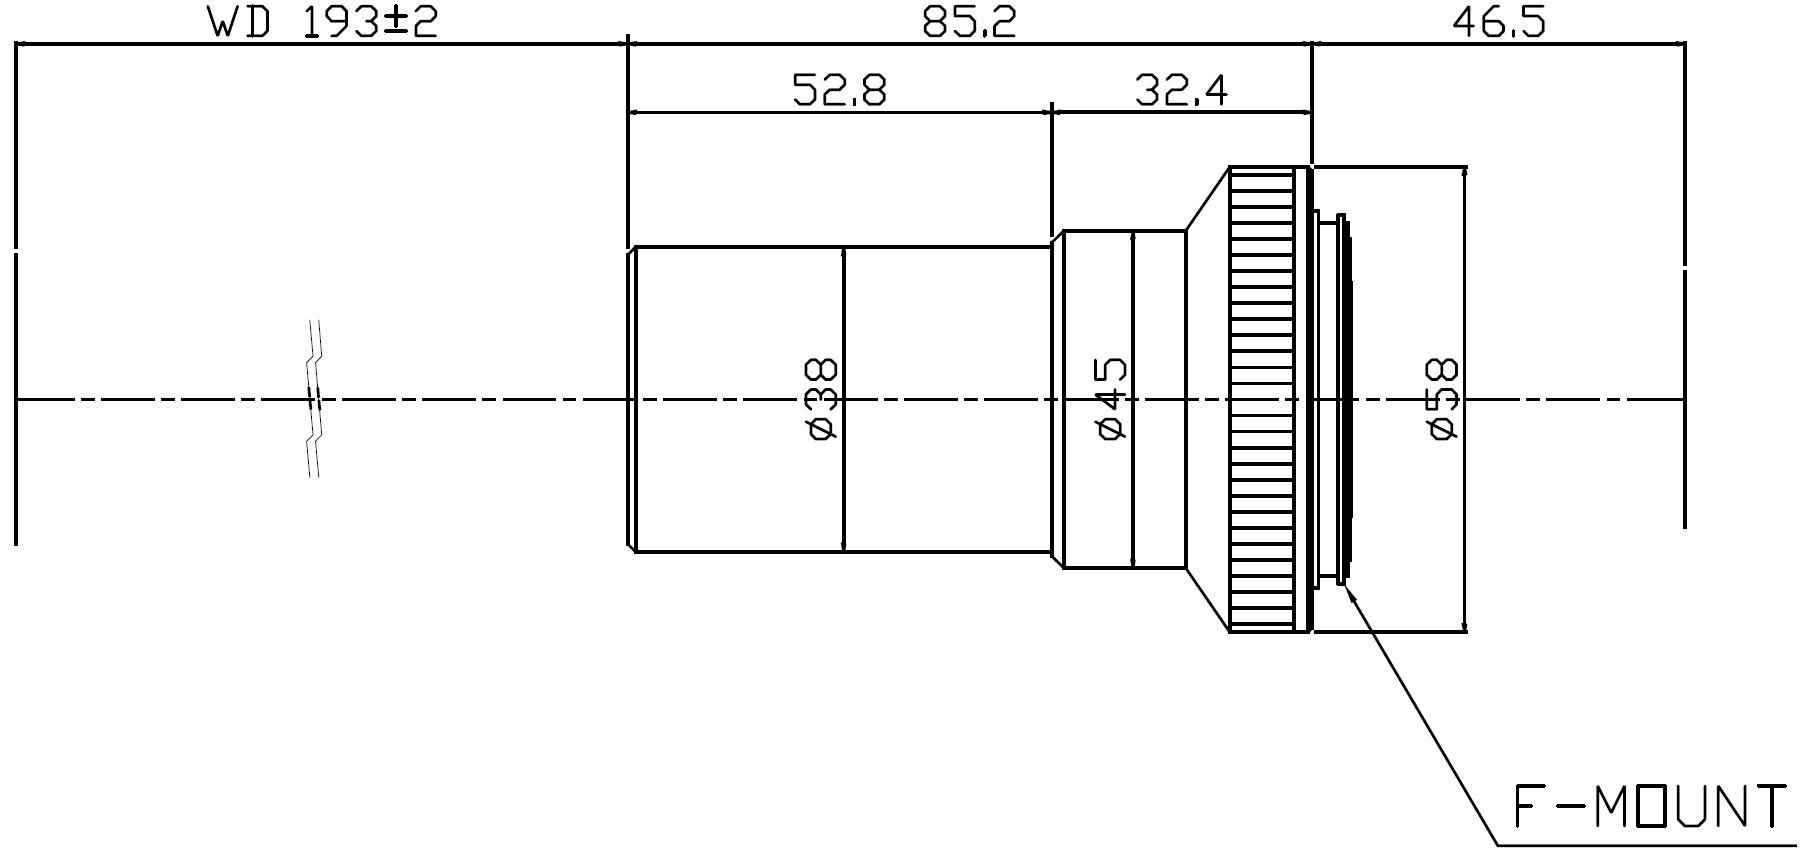 Lensagon MF8M-075-193